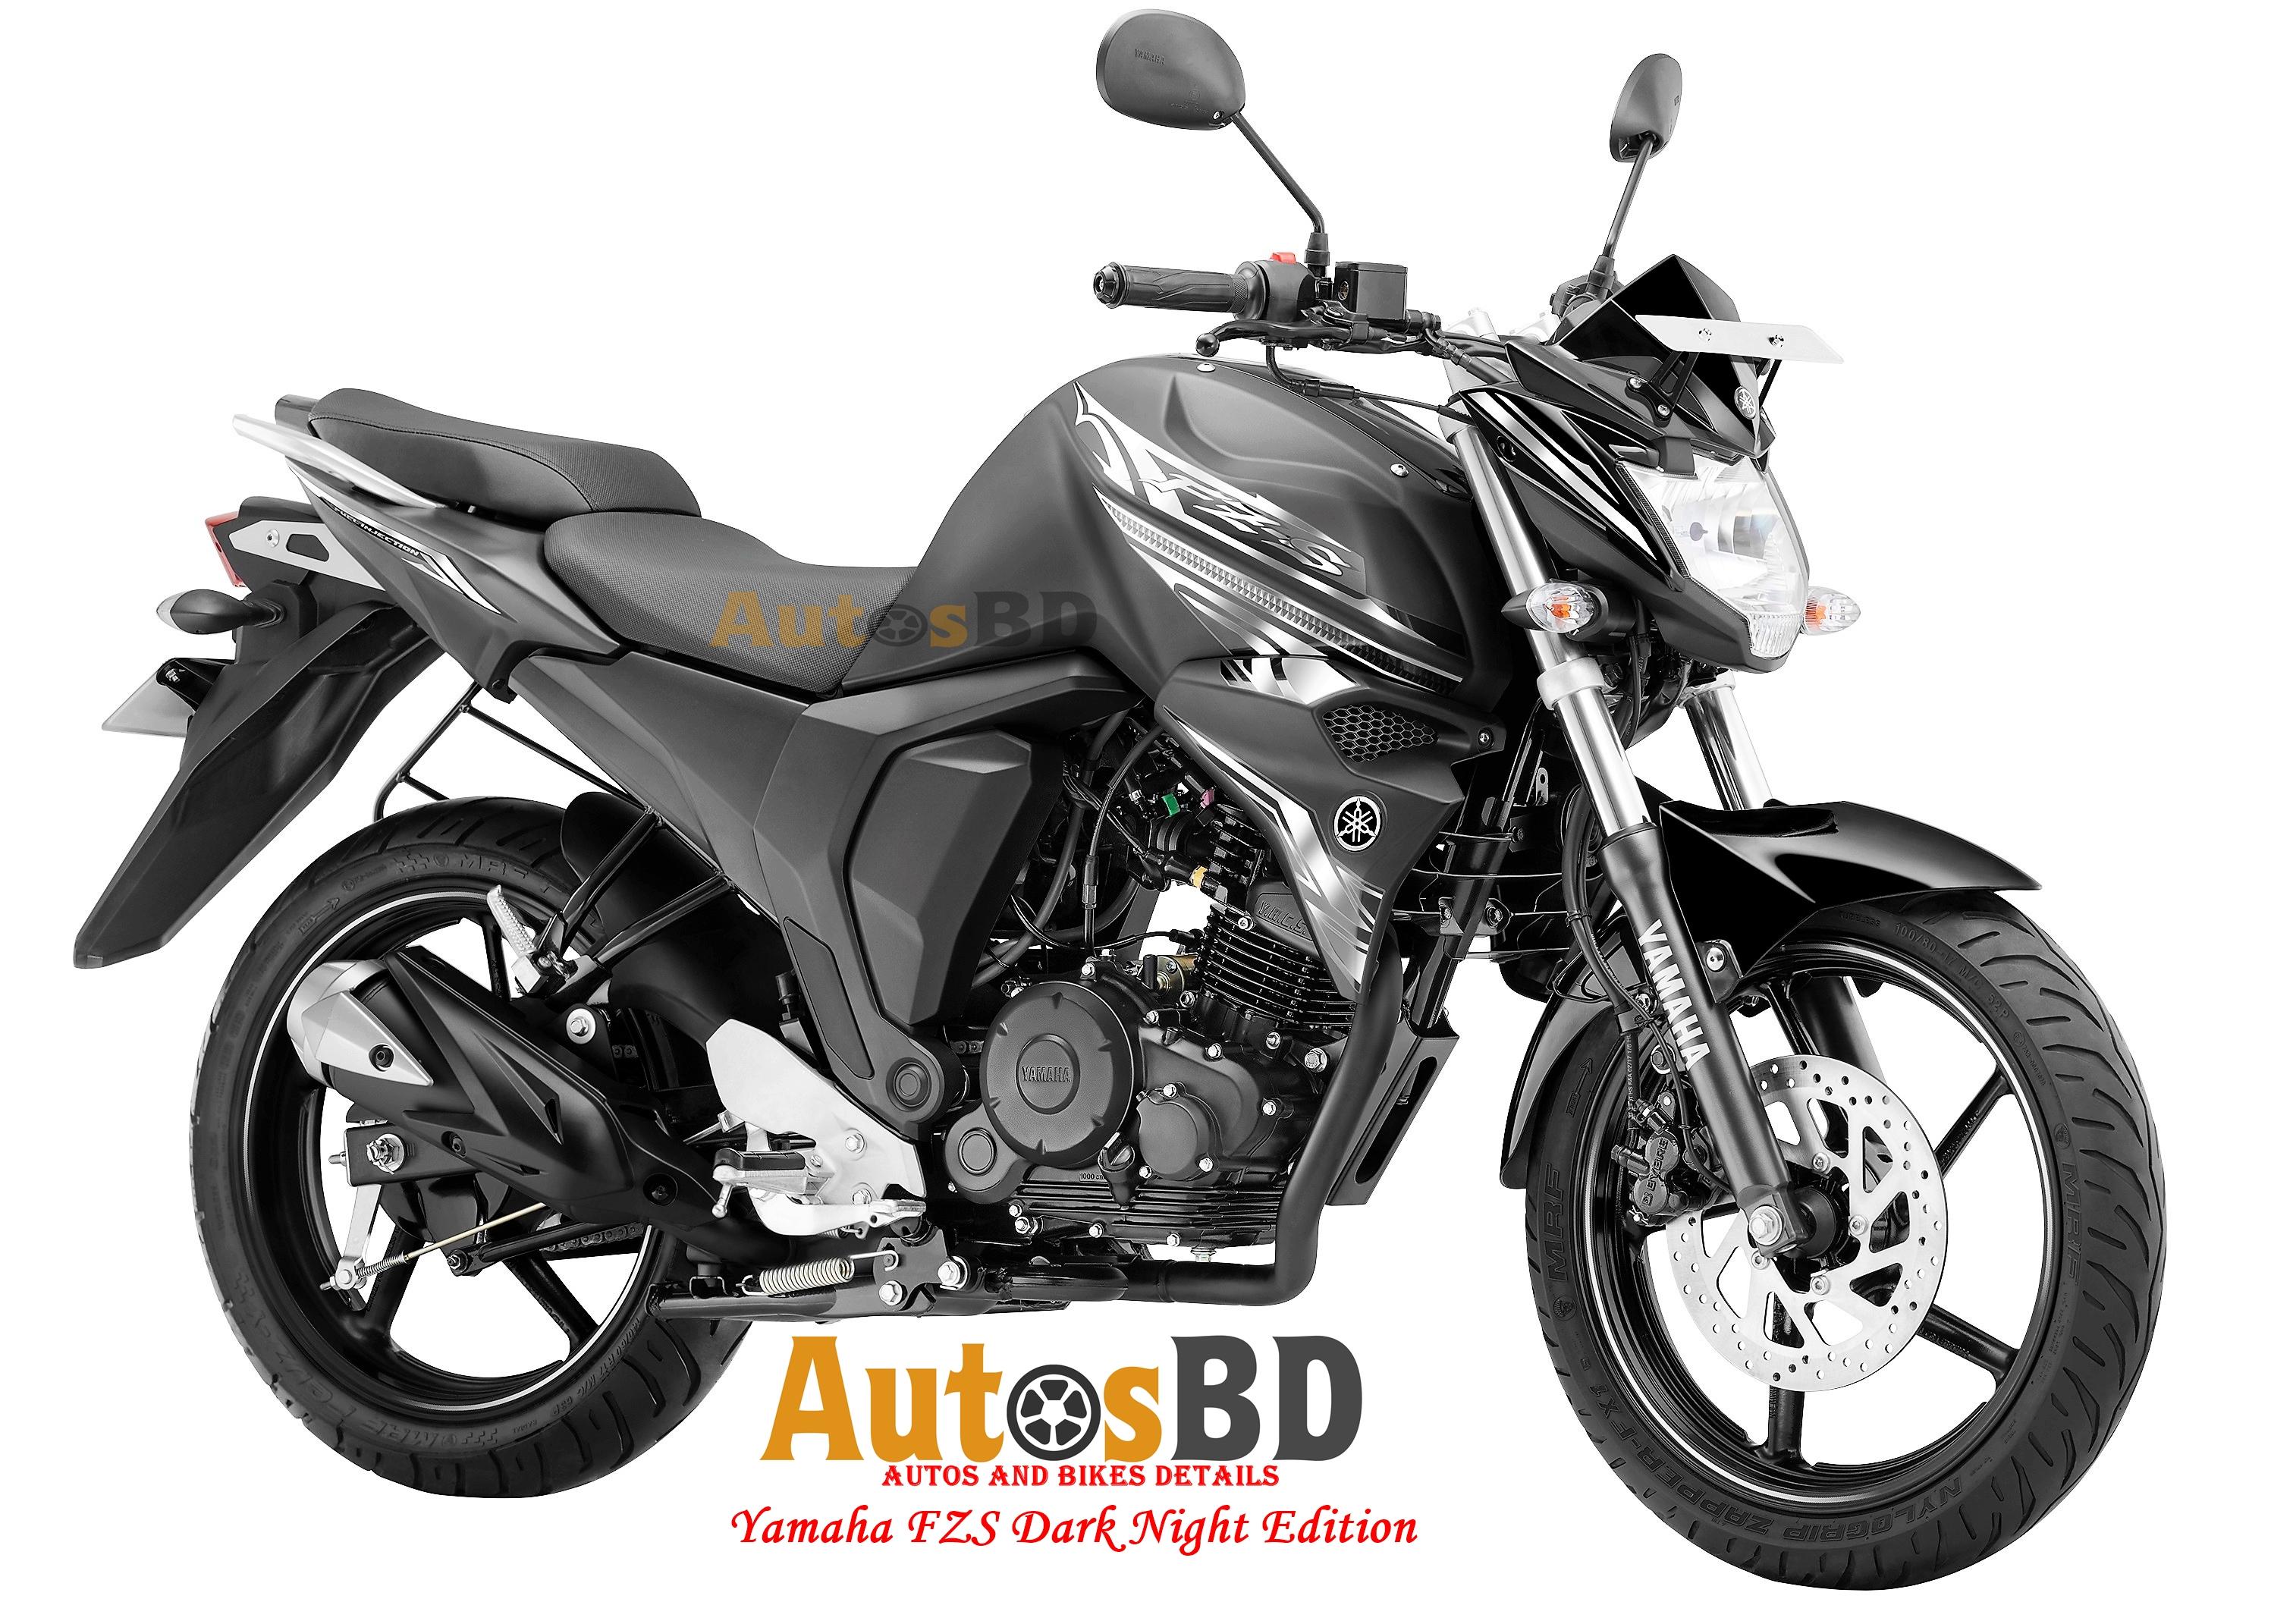 Yamaha FZS Dark Night Edition Motorcycle Price in India